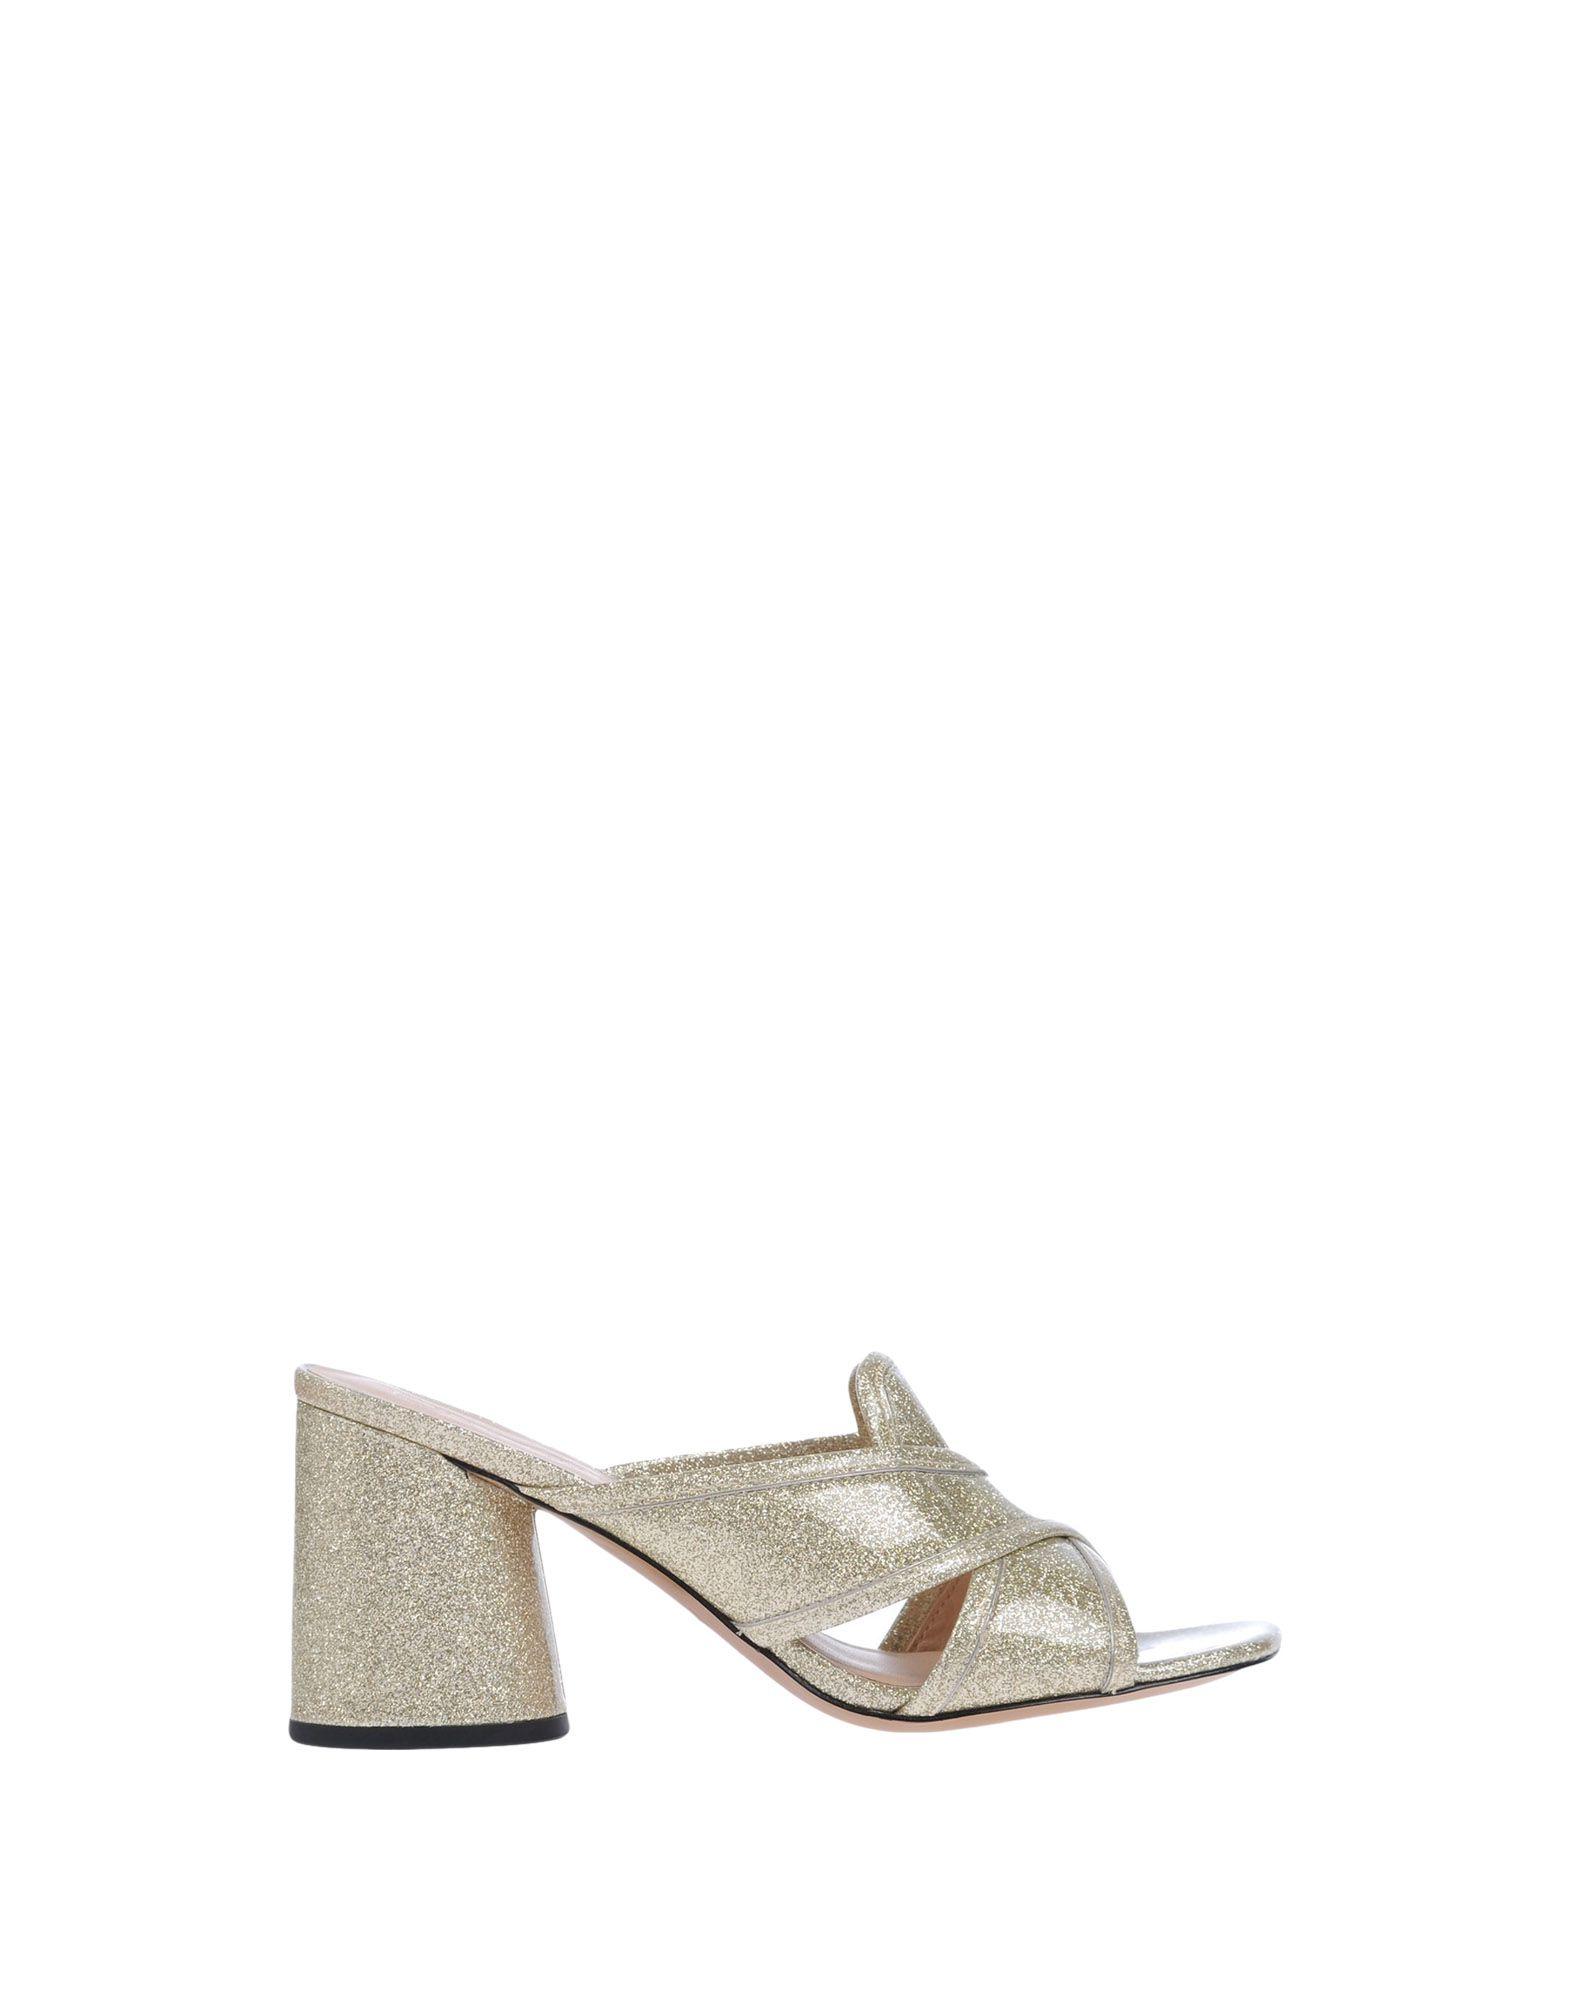 Stilvolle Marc billige Schuhe Marc Stilvolle Jacobs Sandalen Damen  11503352DL 305b4a